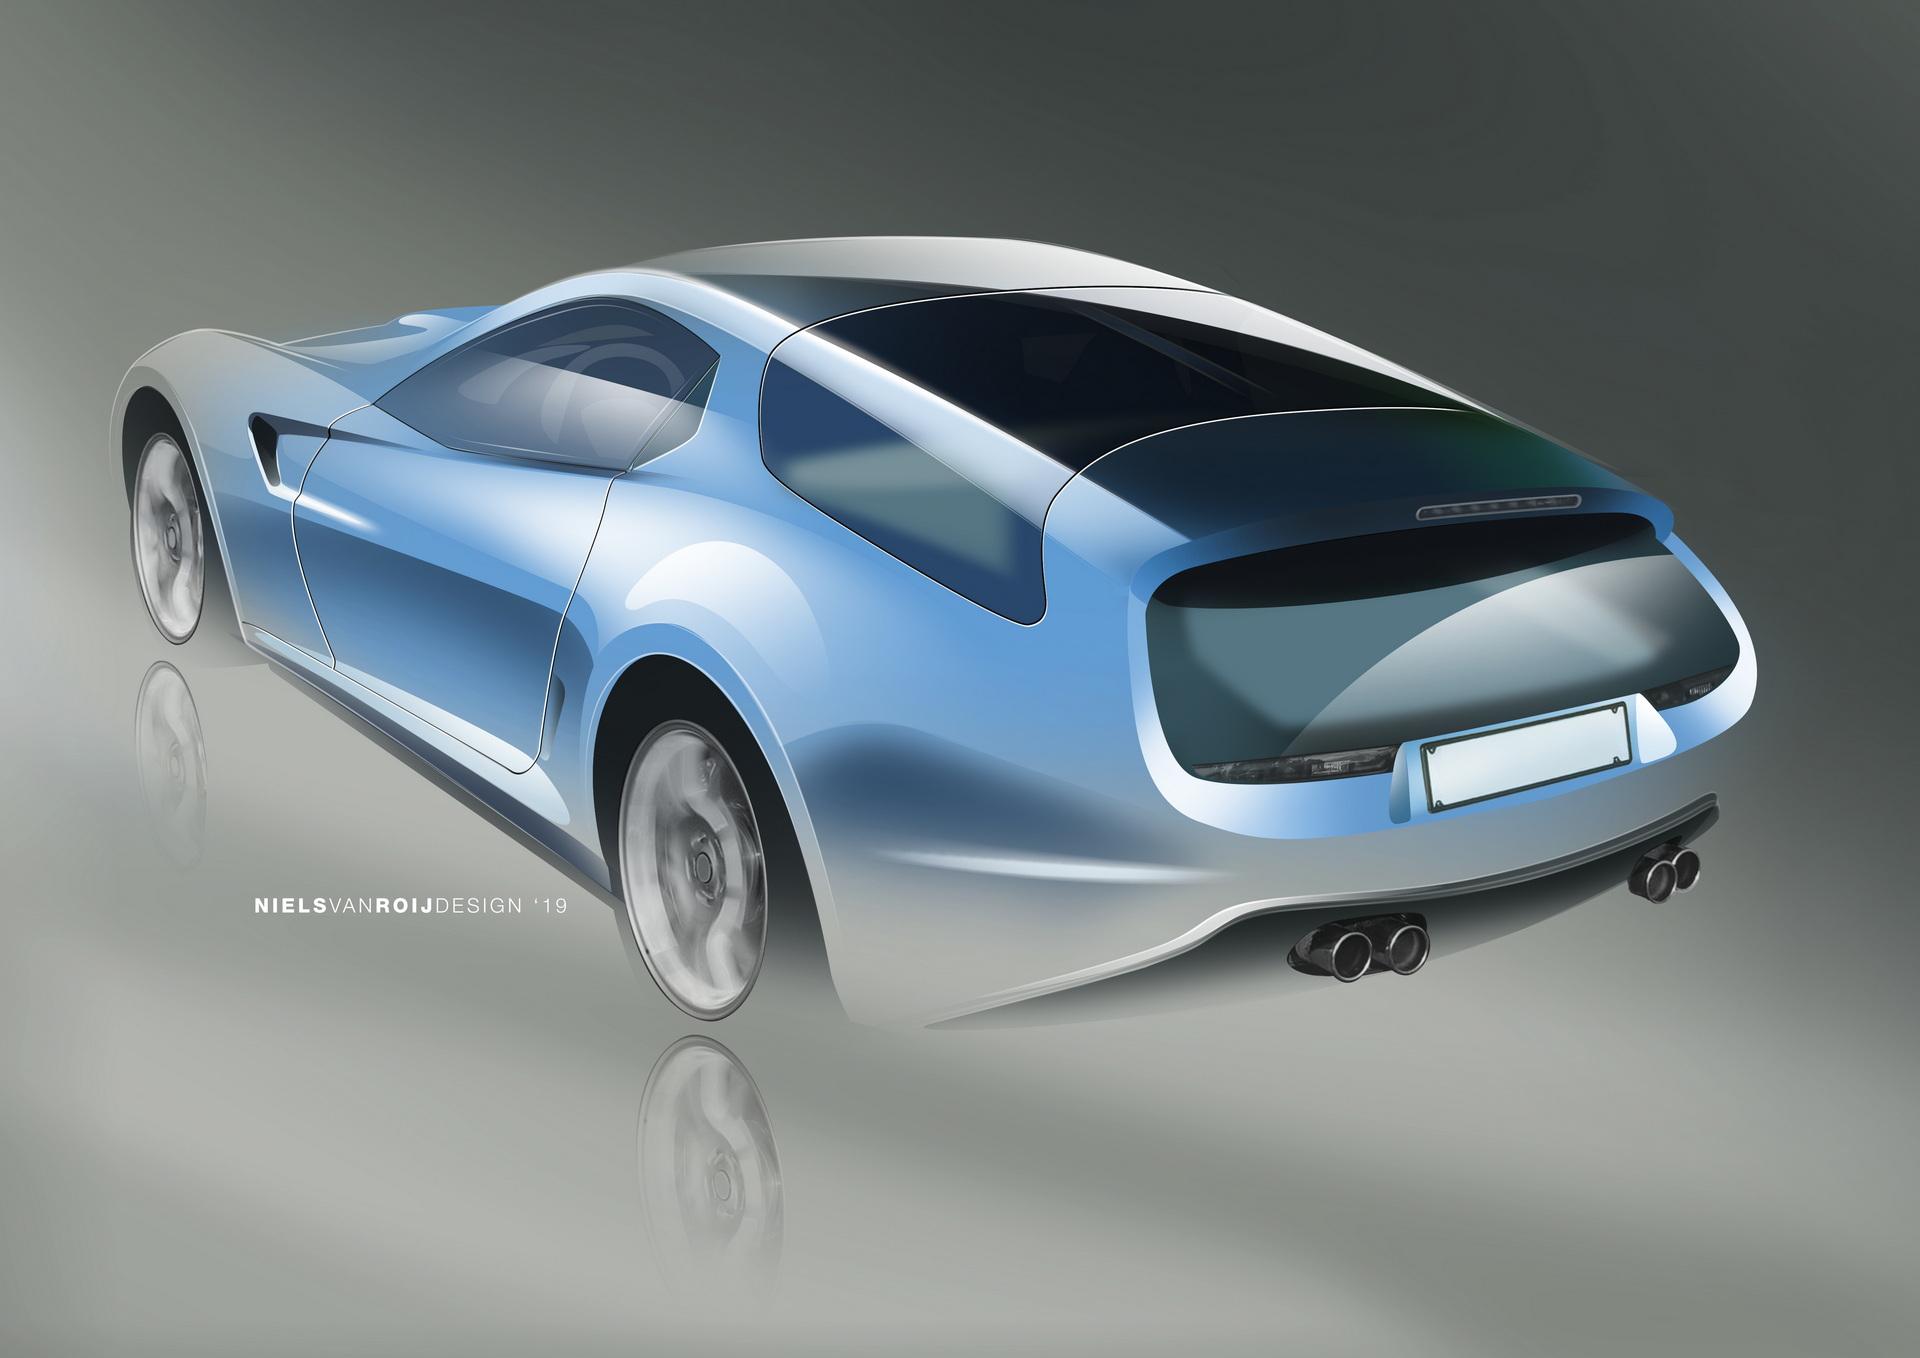 Ferrari-Daytona-Shooting-Brake-Hommage-by-Niels-van-Roij-Design-17